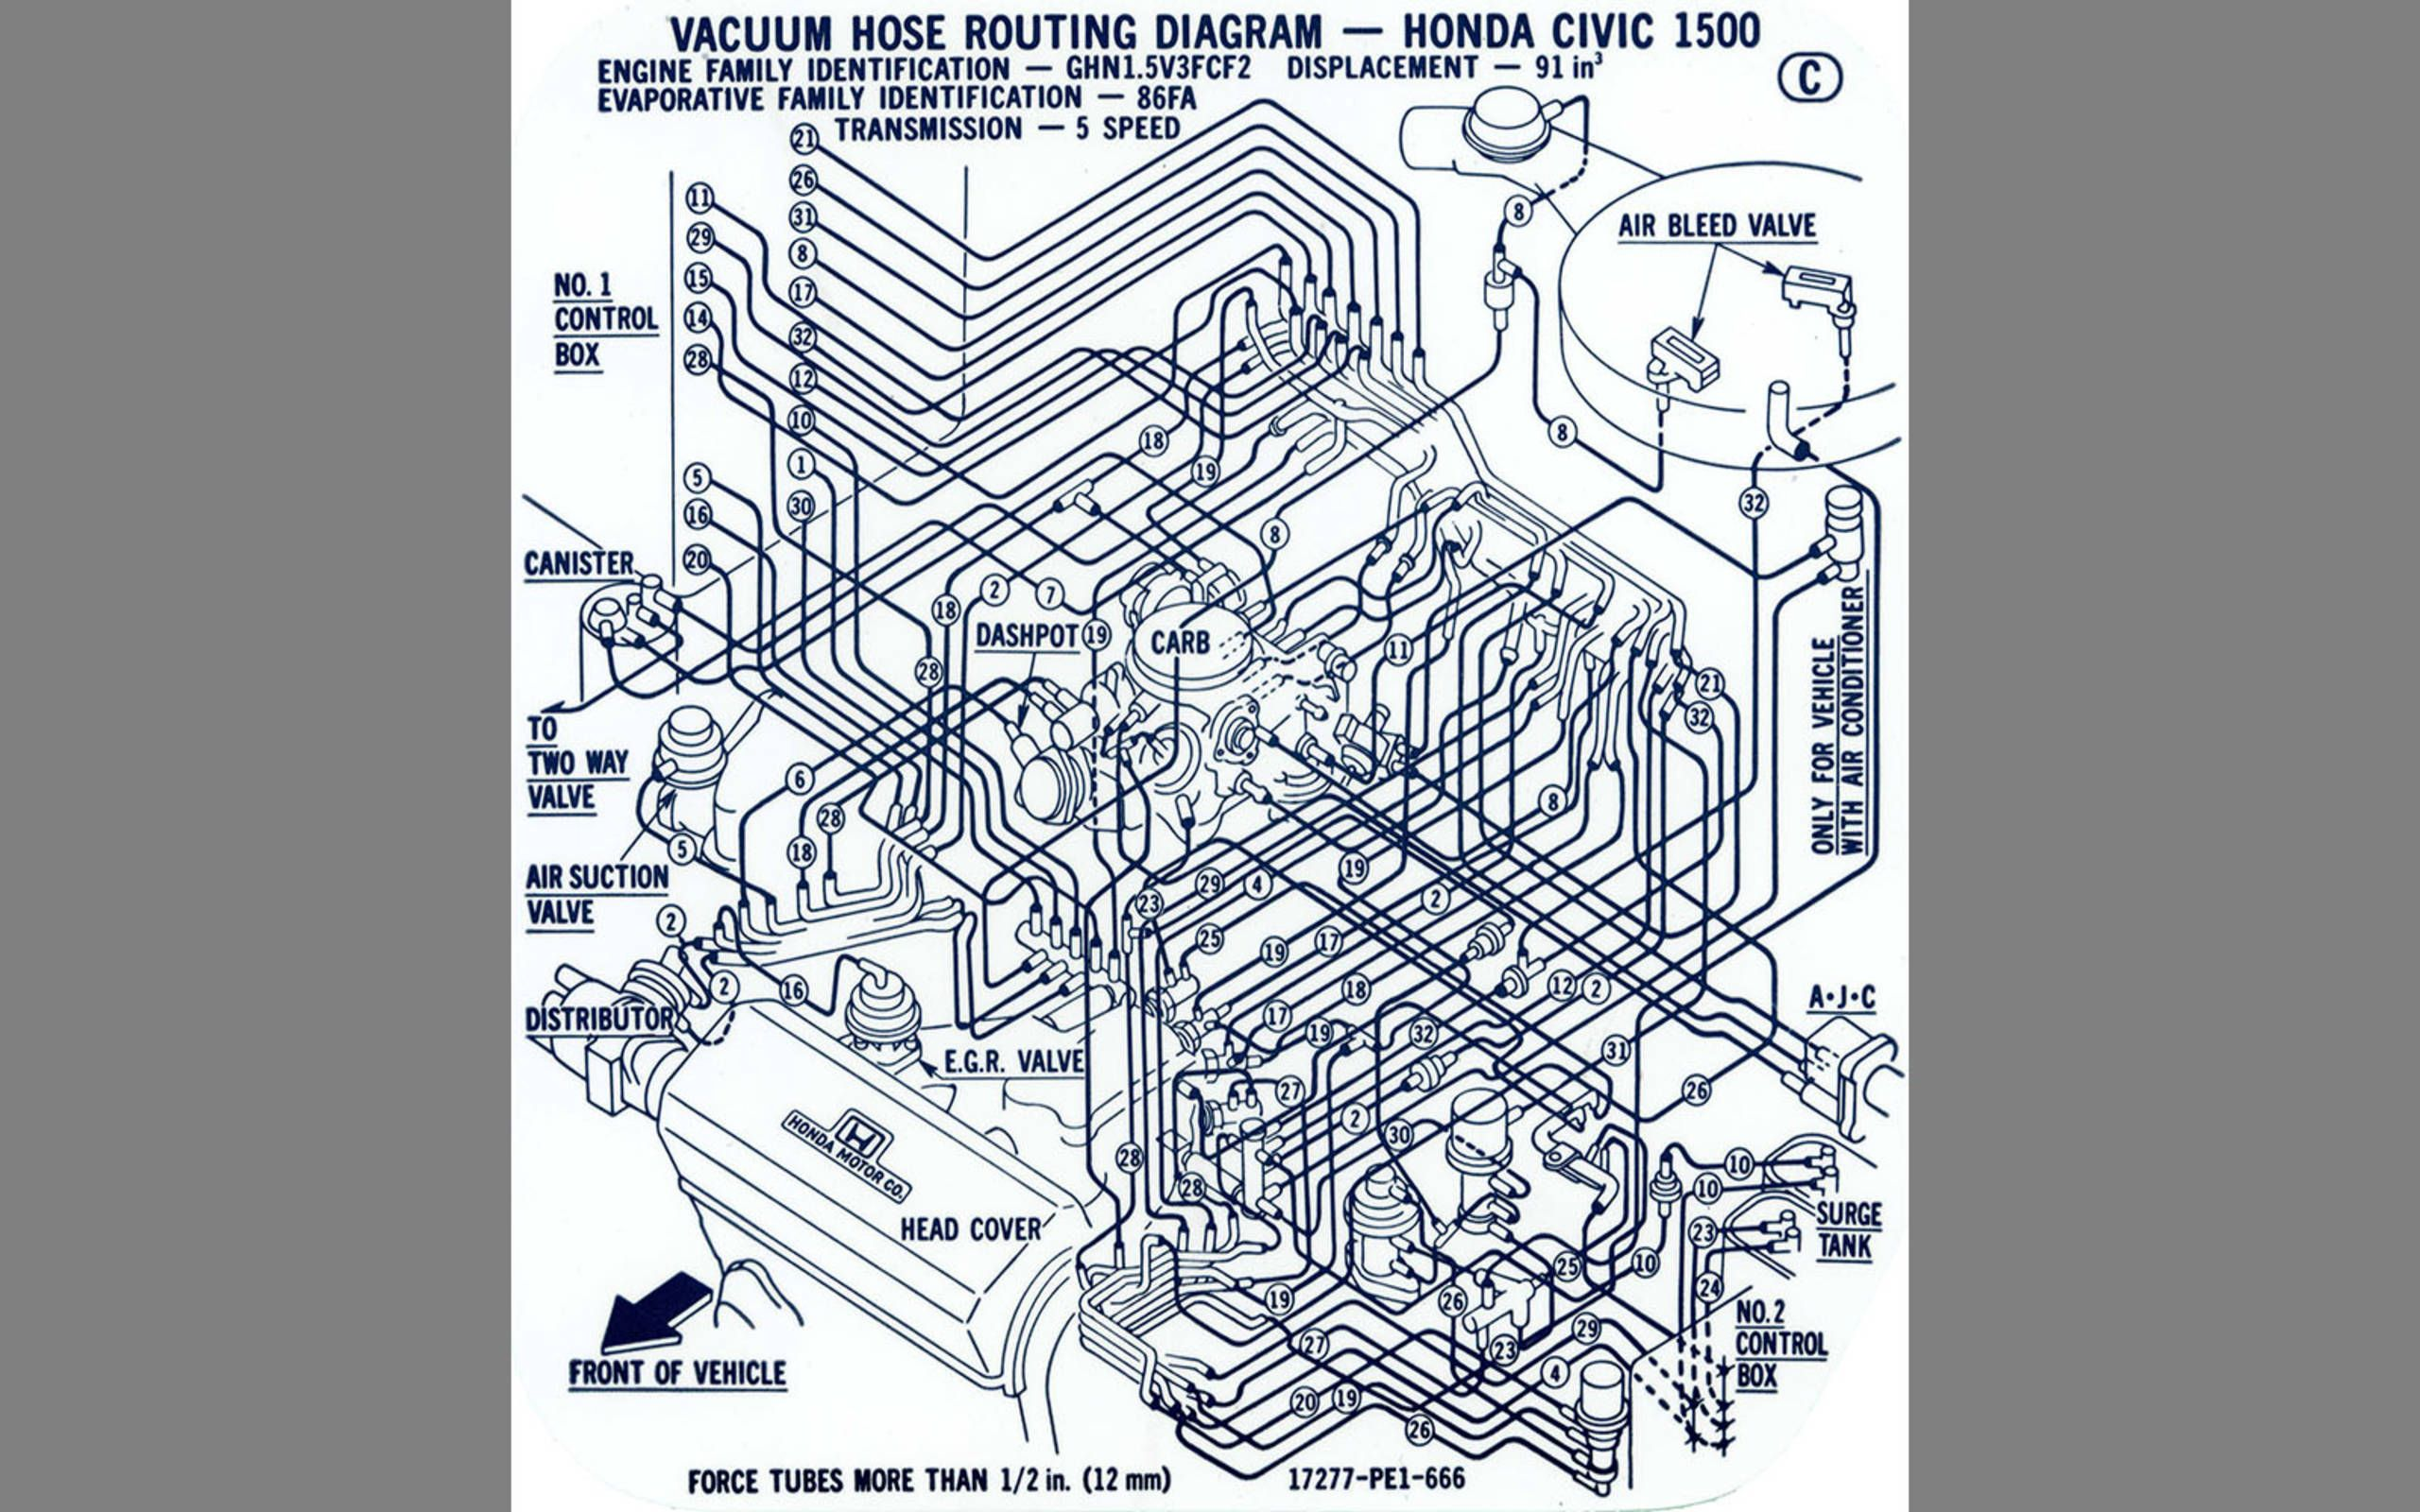 [SCHEMATICS_4UK]  A close look at the nightmare 1980s Honda CVCC vacuum hose tangle | 1986 Honda Civic Engine Diagram |  | Autoweek